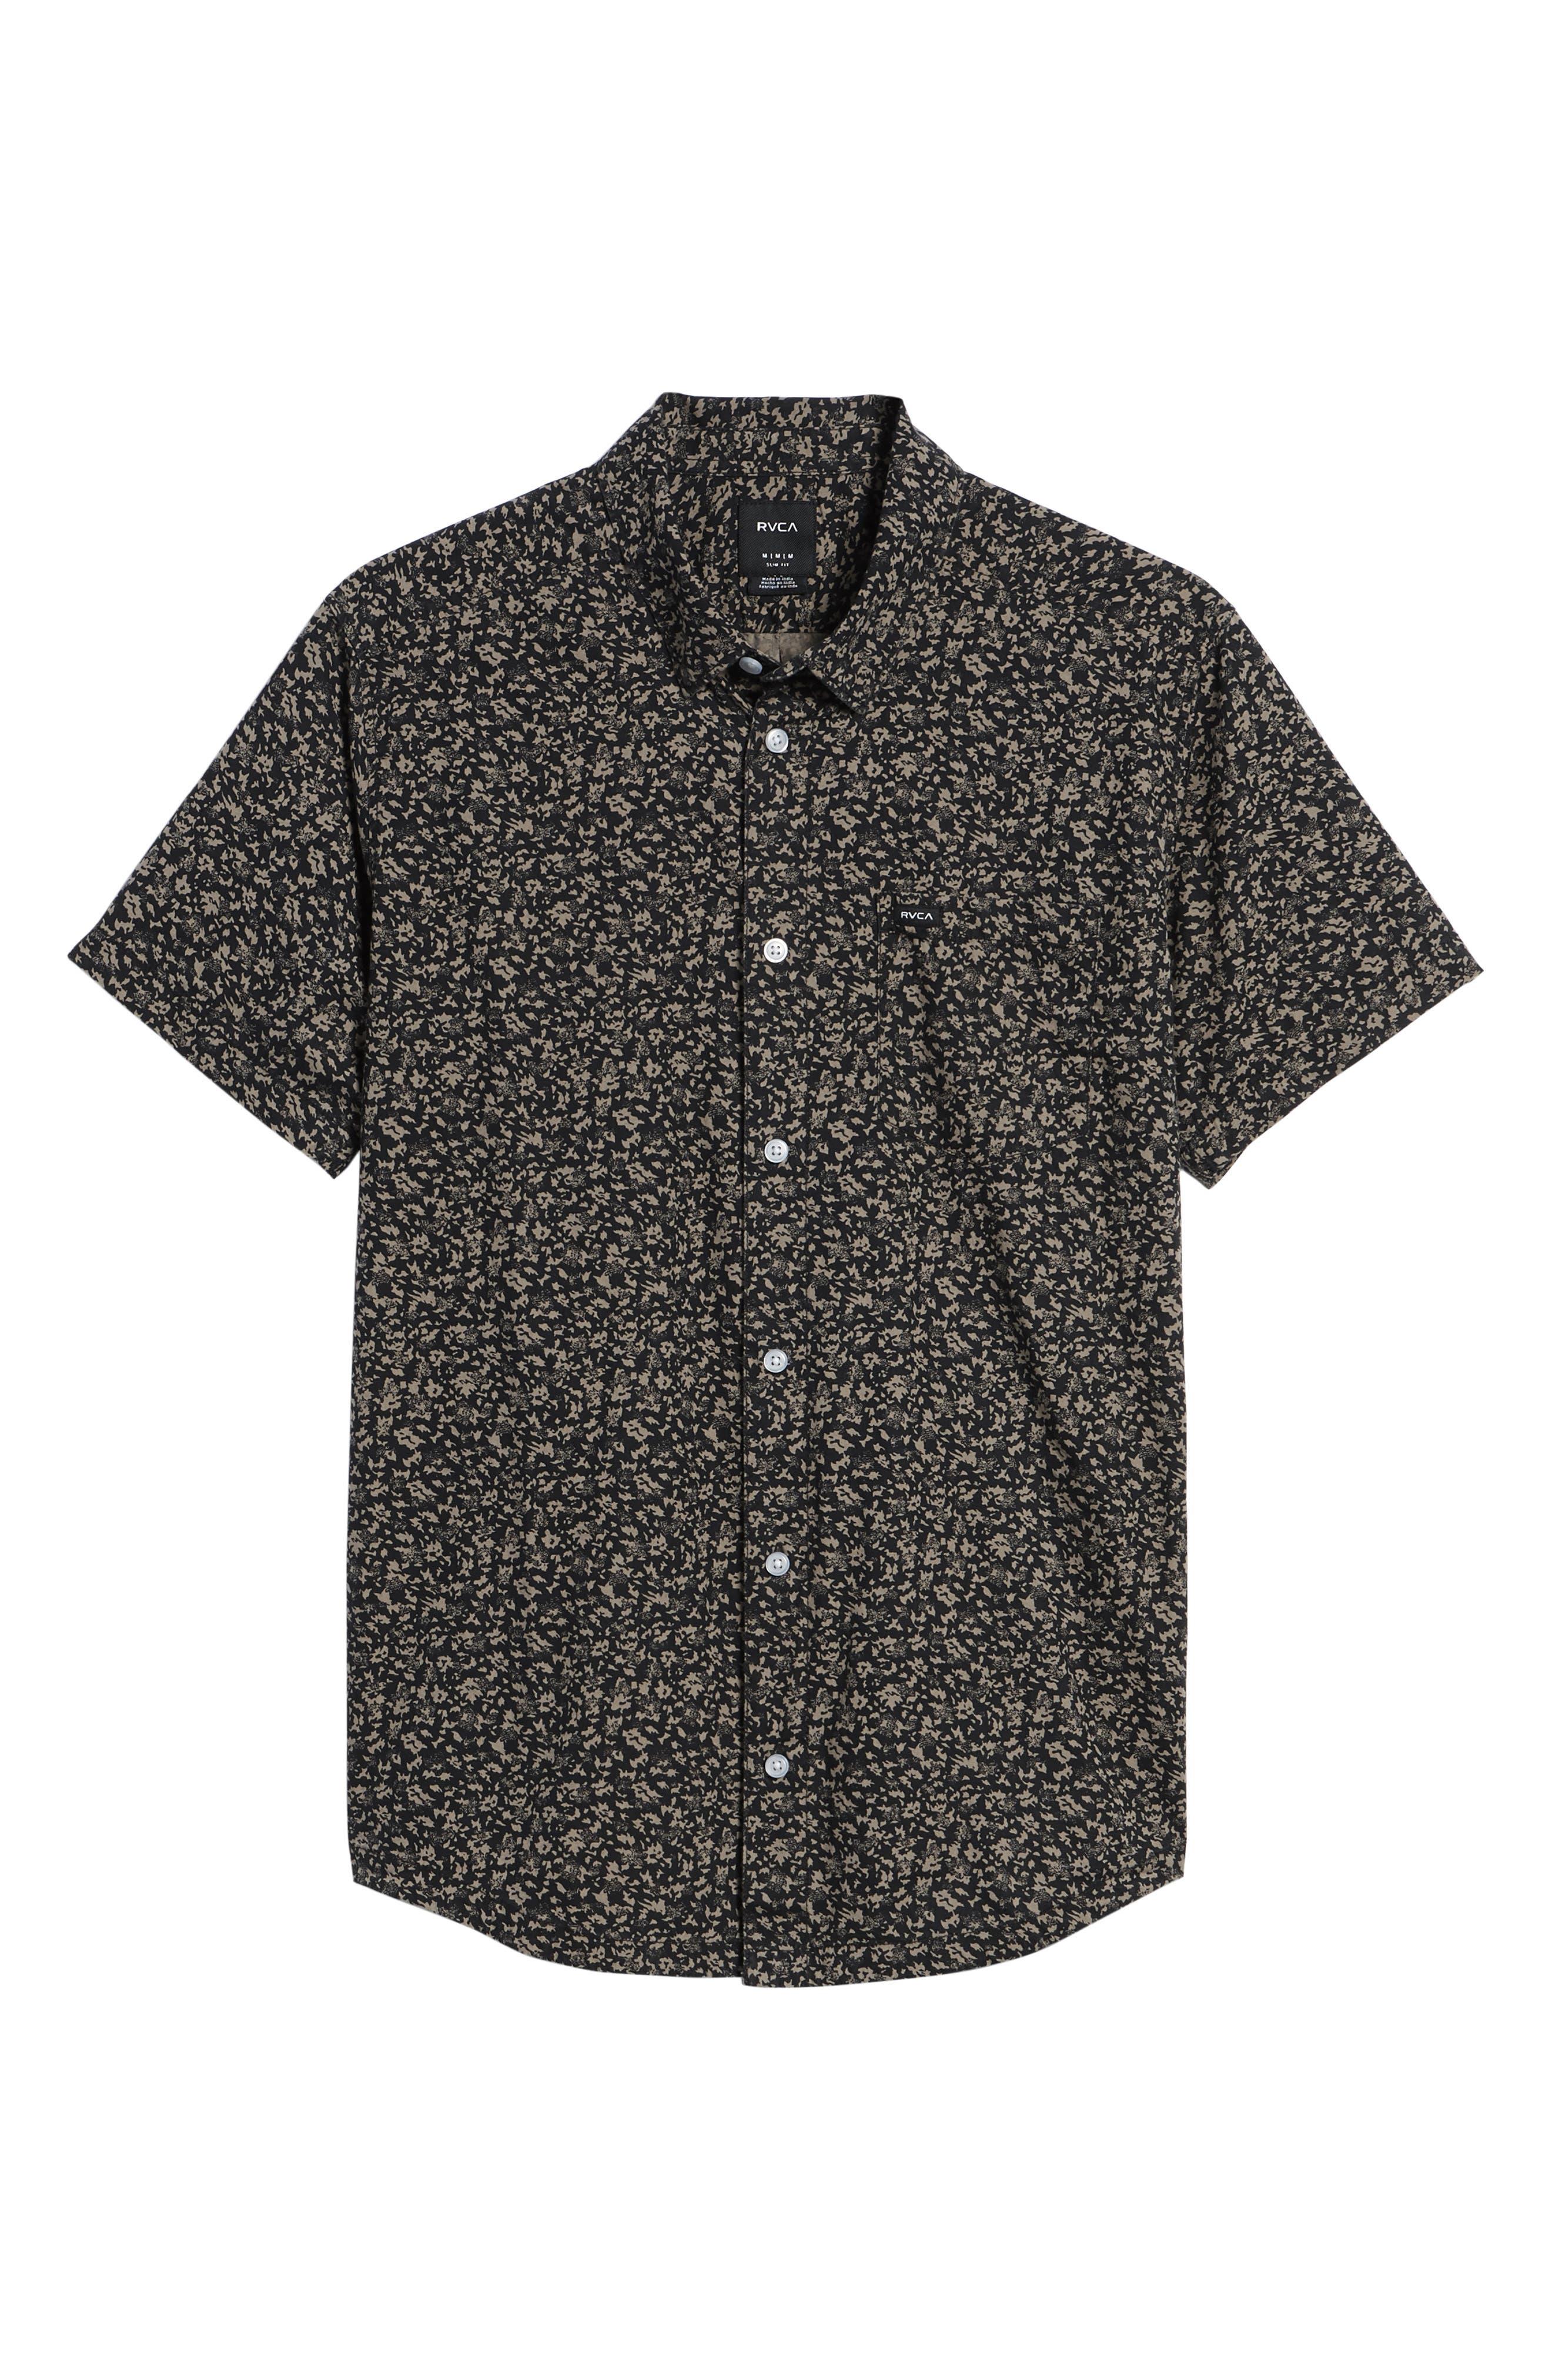 Dresden Woven Shirt,                             Alternate thumbnail 6, color,                             Pirate Black